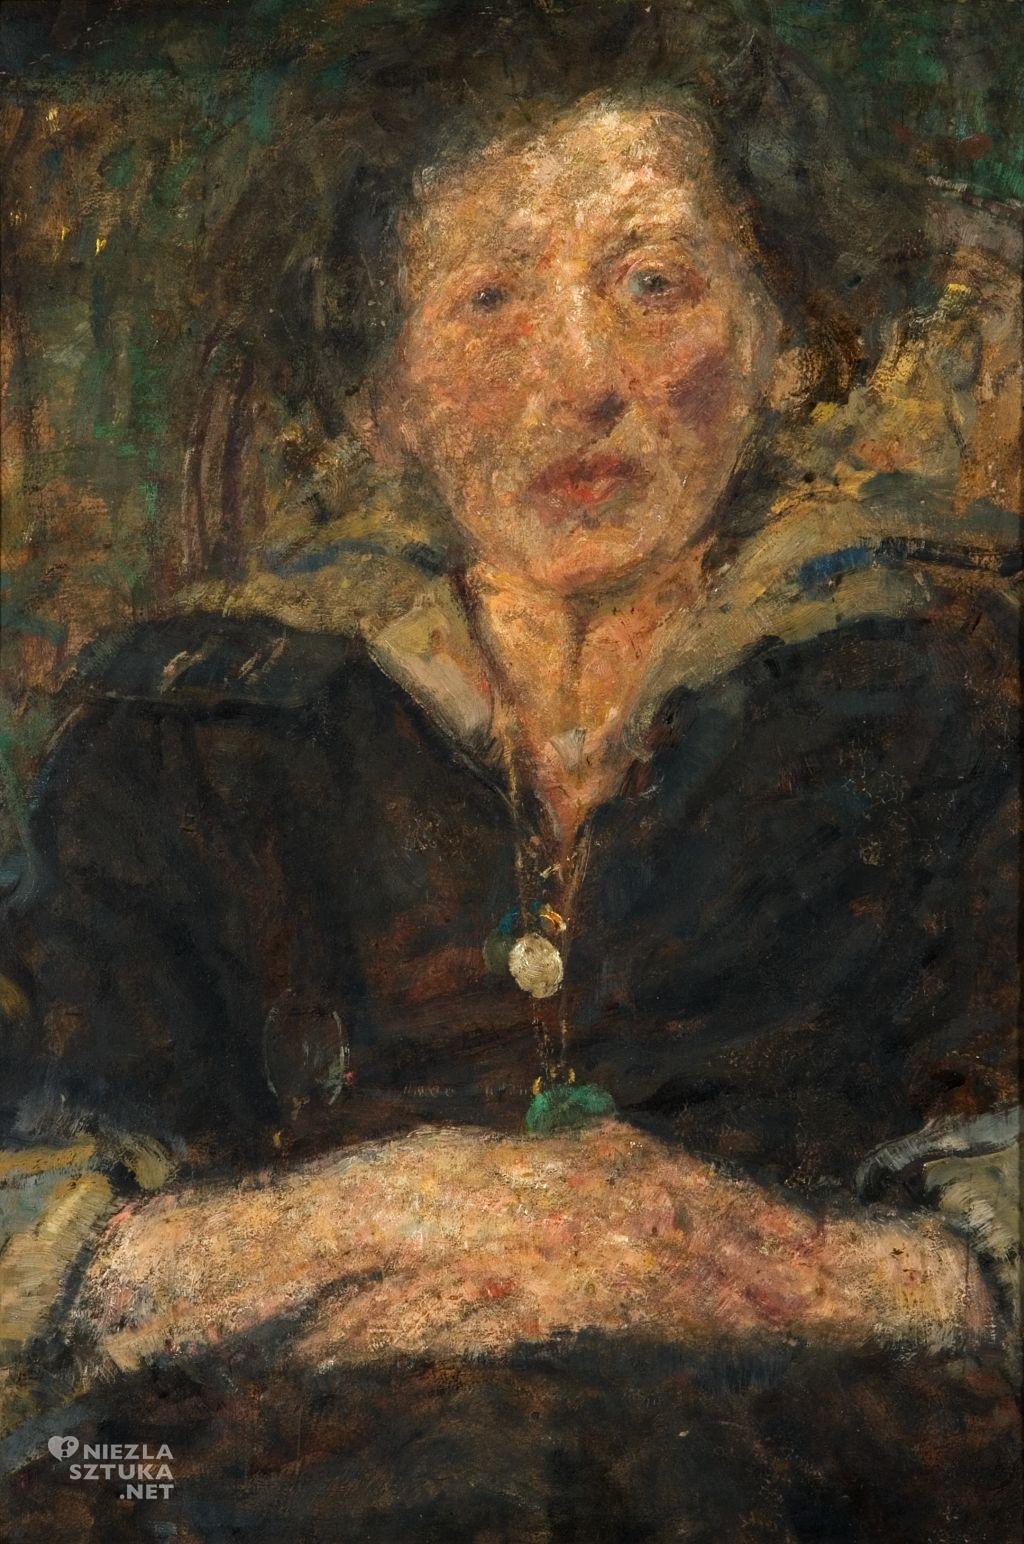 Olga Boznańska, Portret pianistki Fridy Eissler, sztuka polska, Niezła sztuka